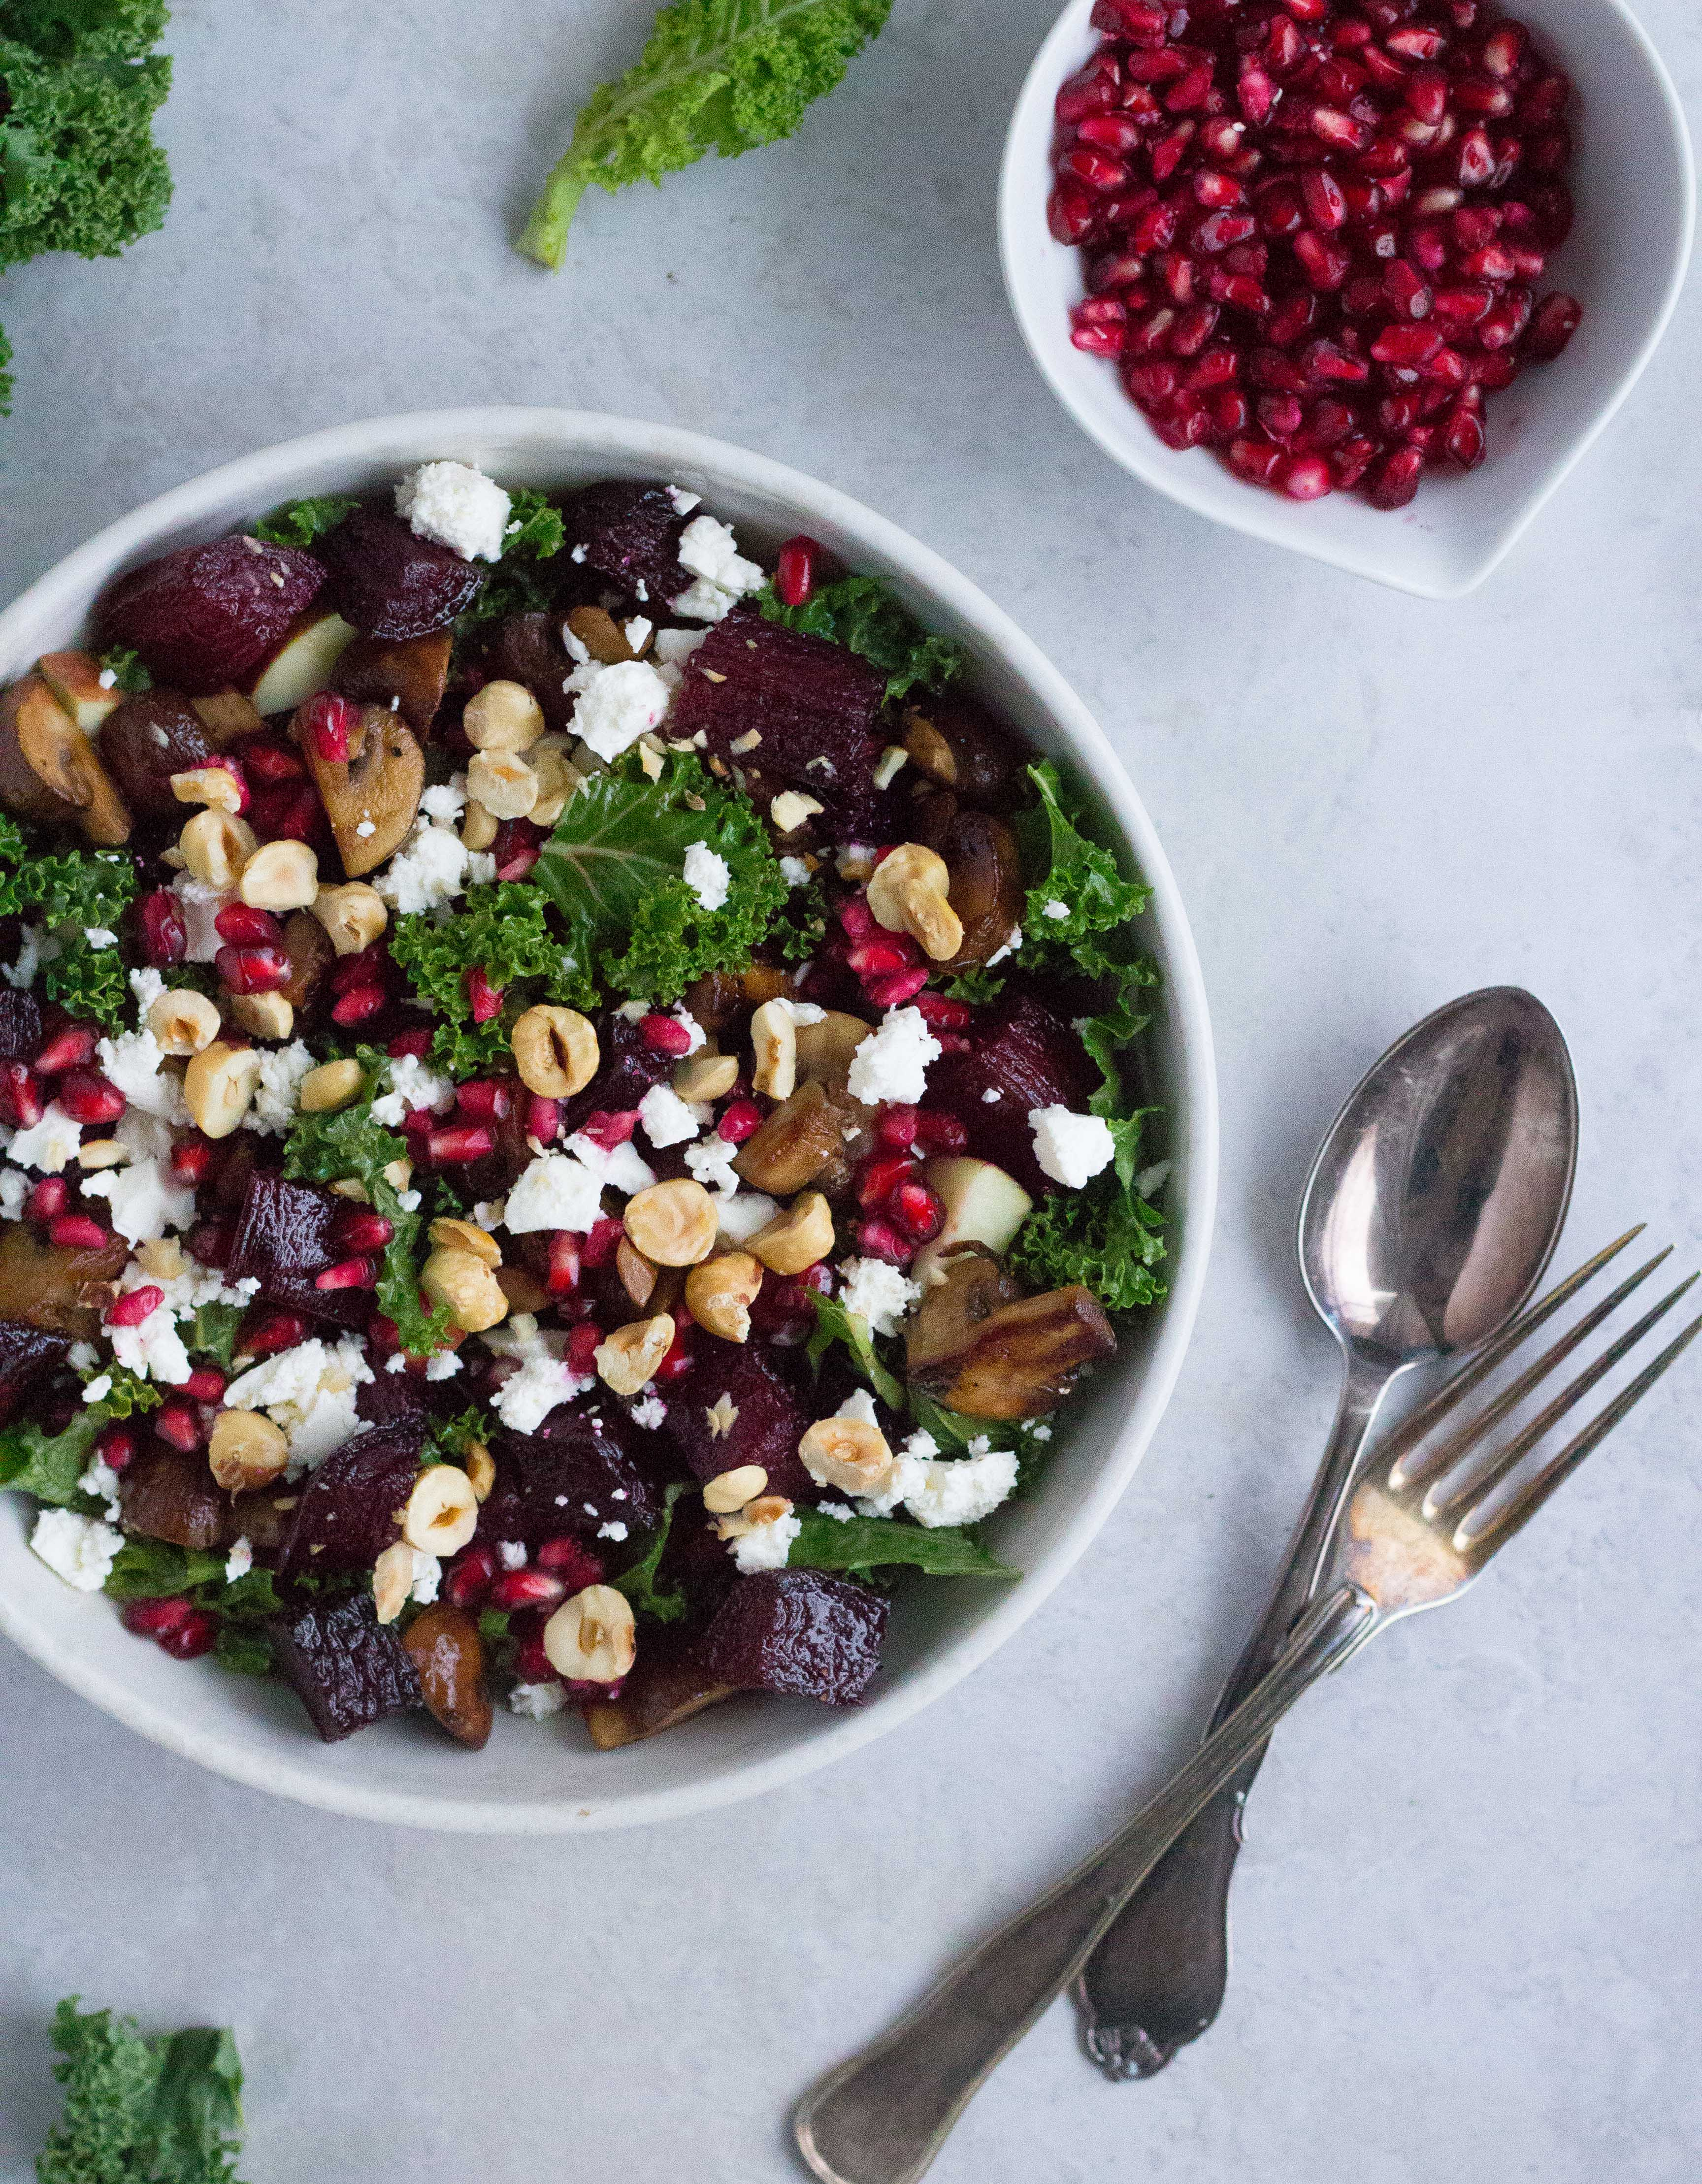 rødbede salat